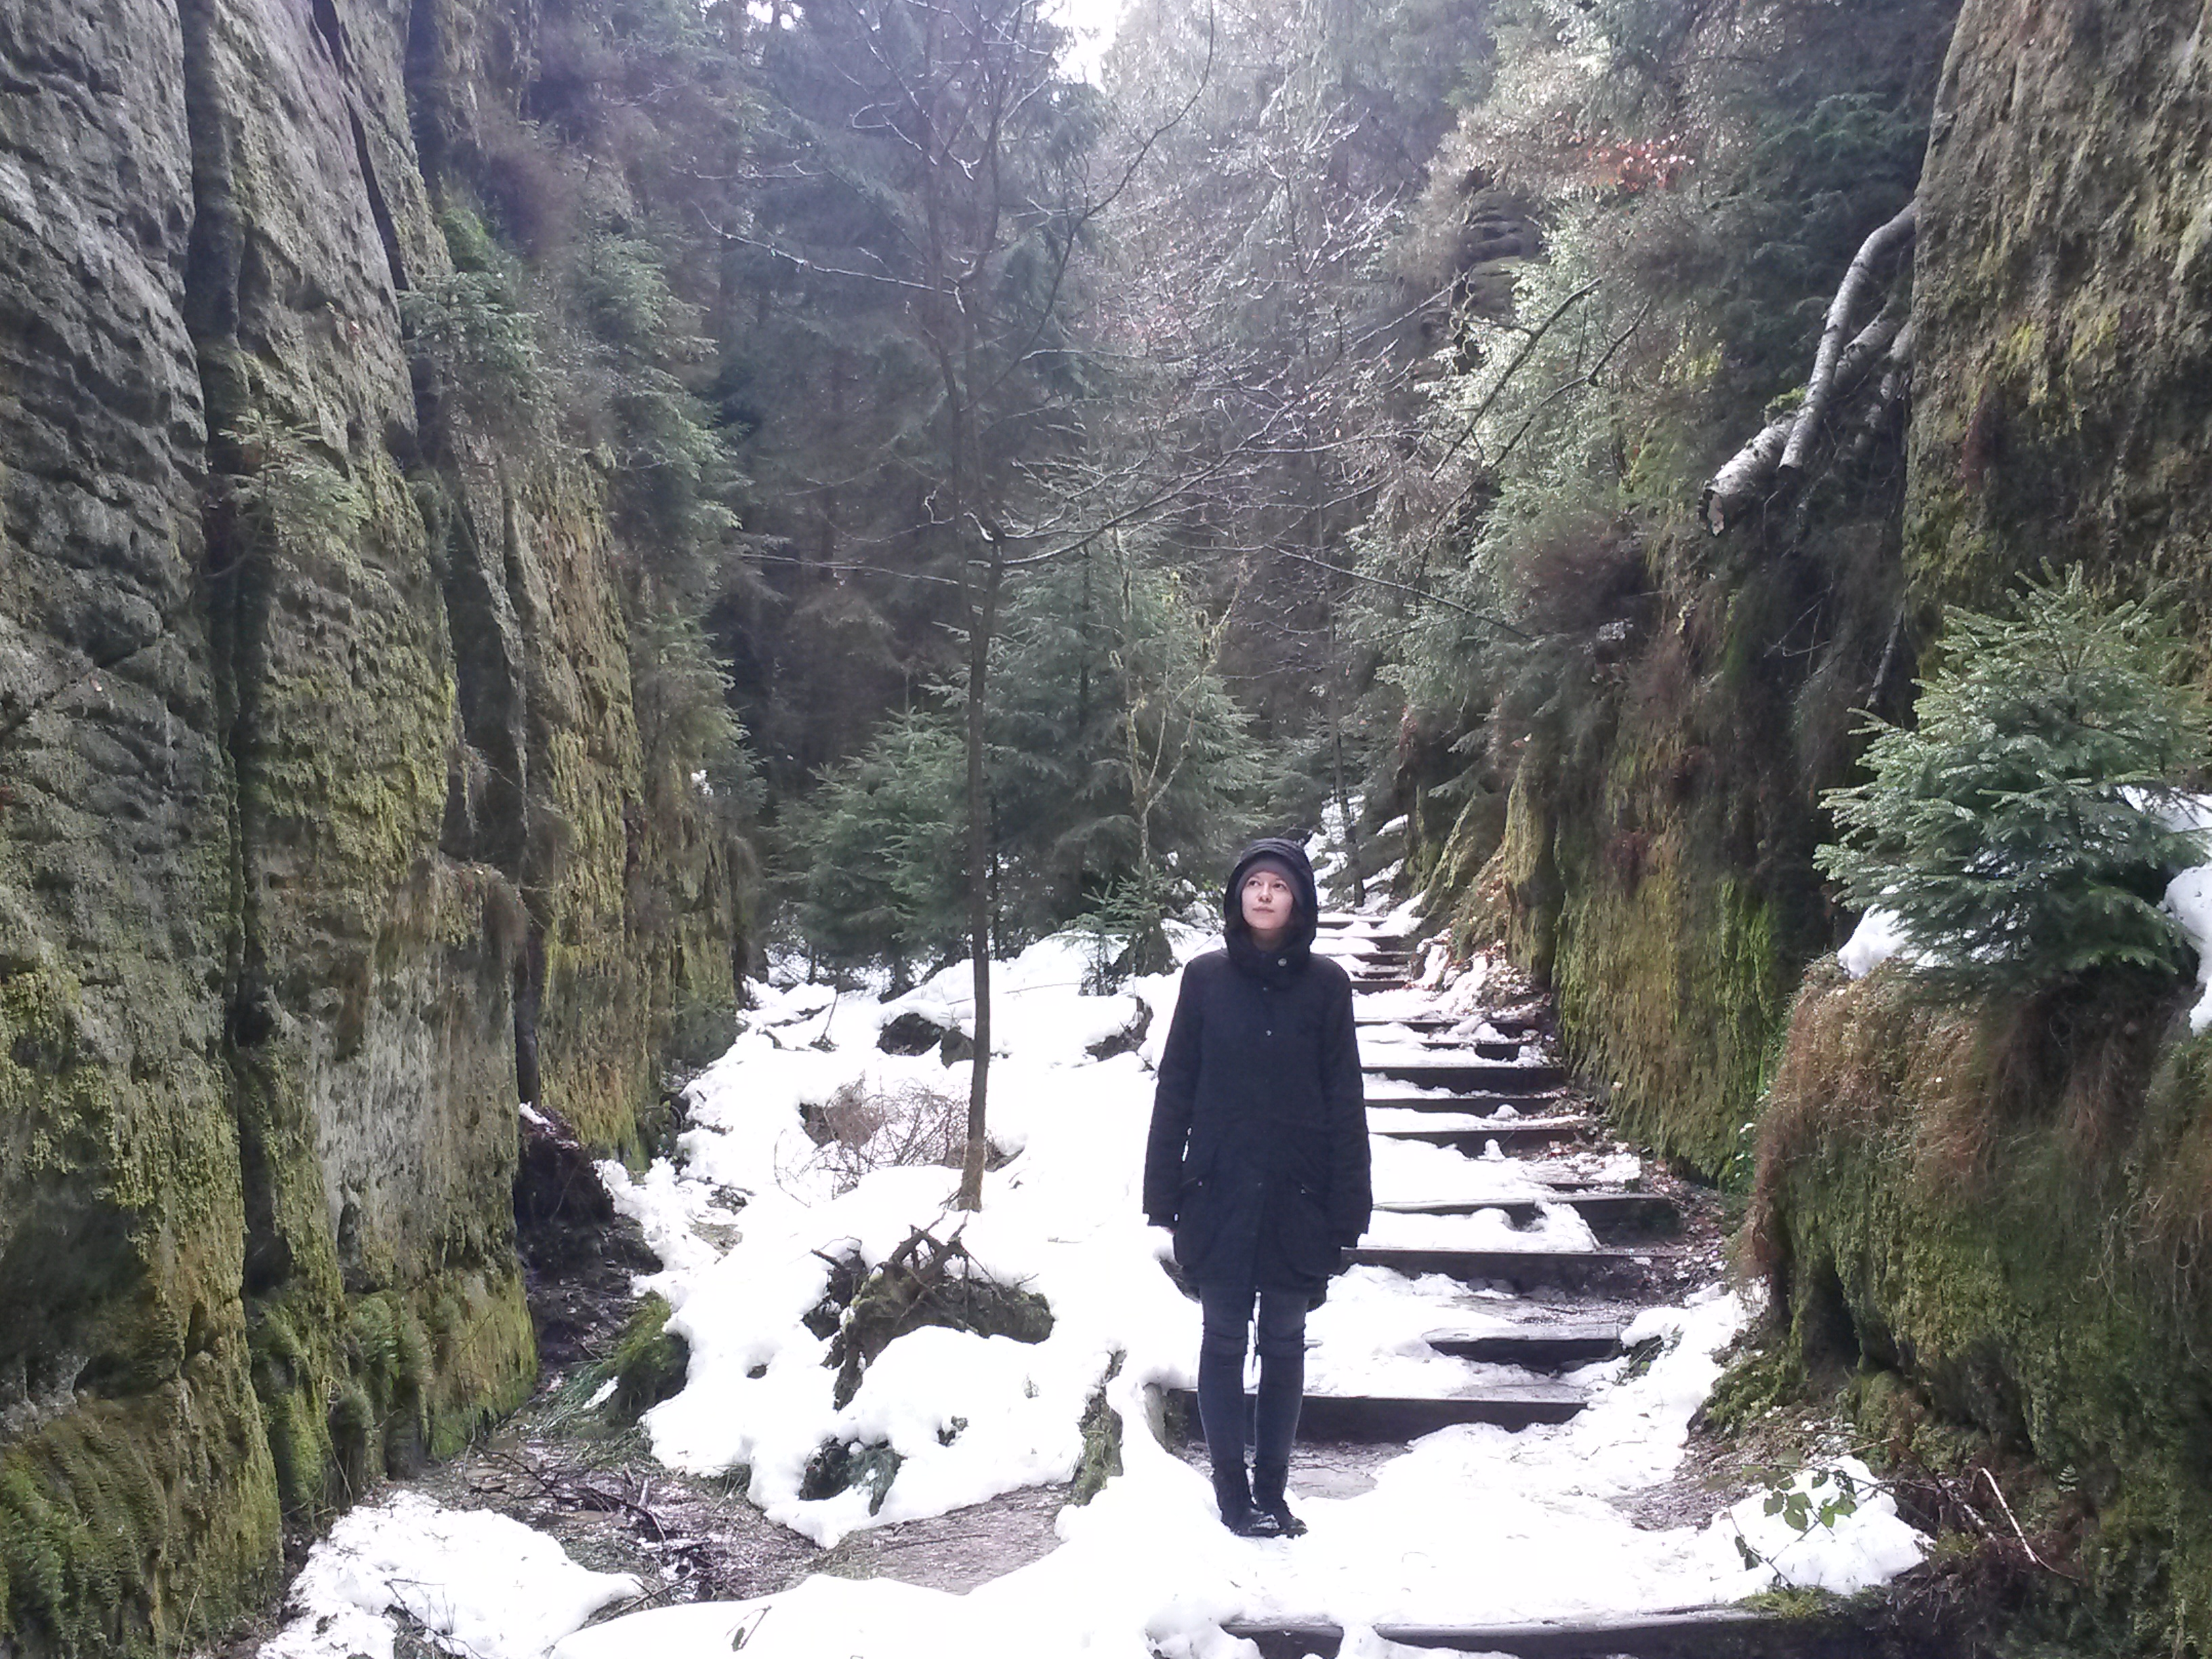 Rebecca Seidel, Trainee bei Projecter, im Interview